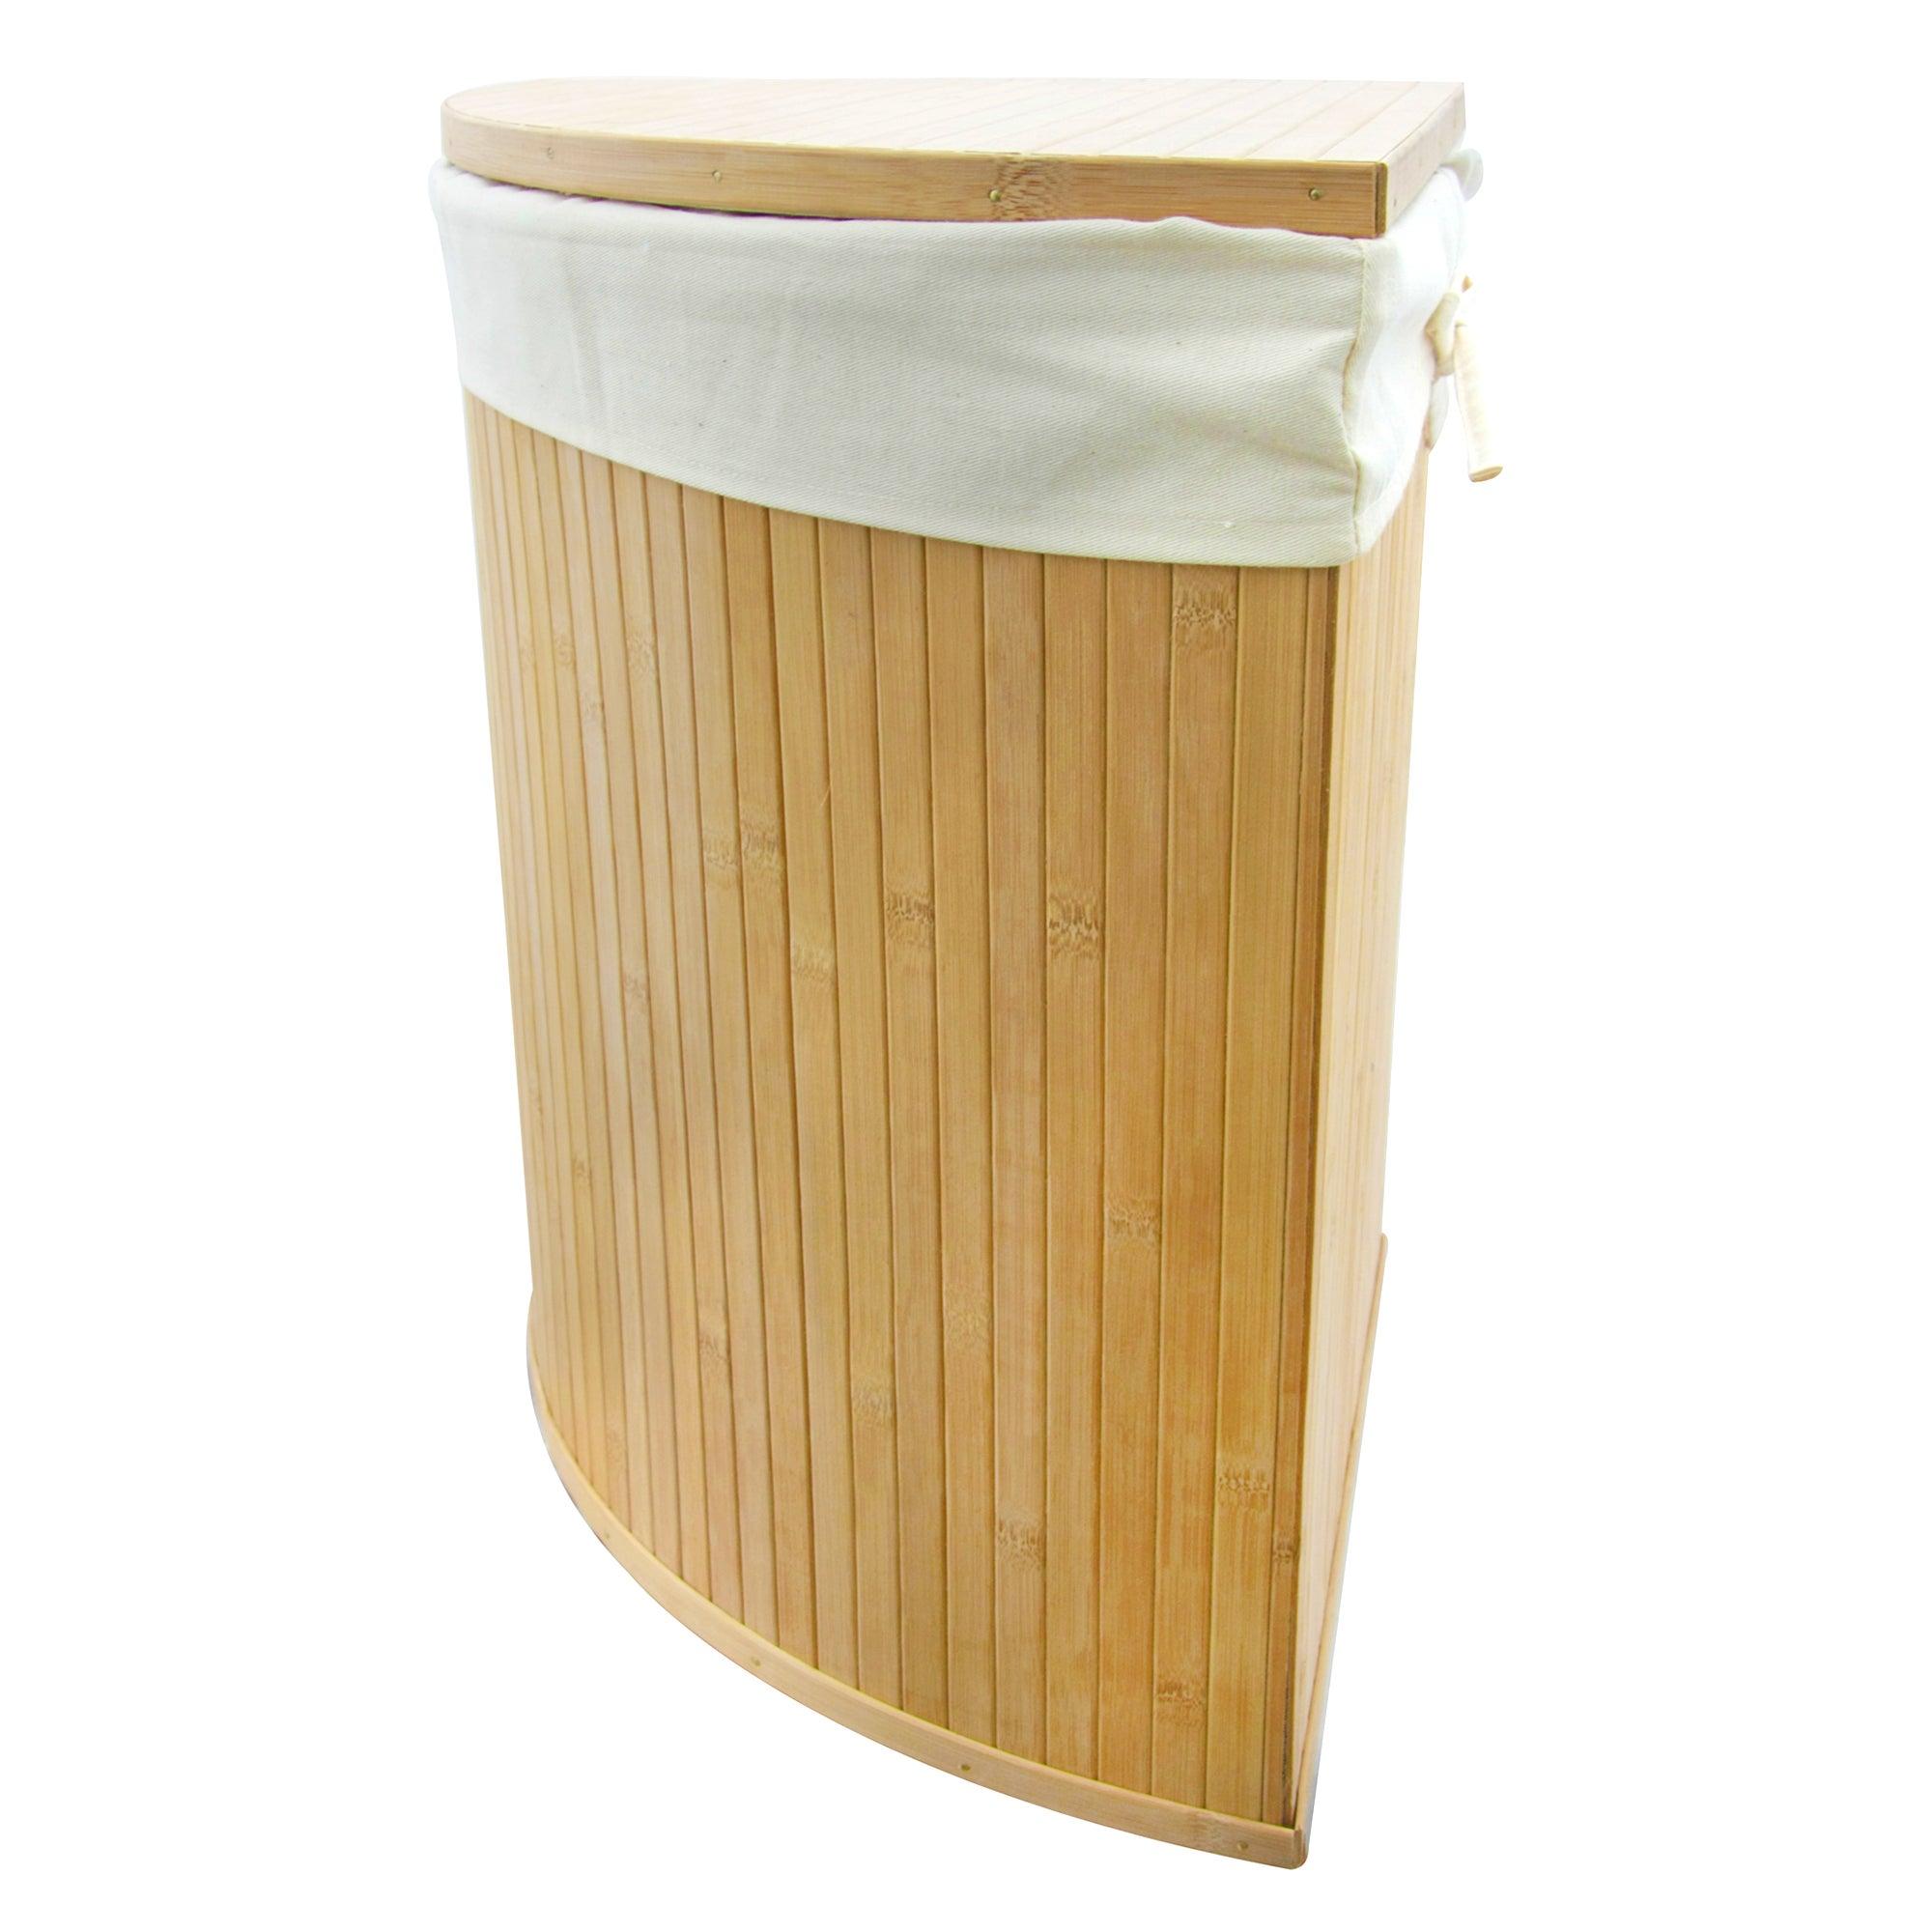 Woodford corner bamboo laundry hamper dunelm - Corner hamper with lid ...